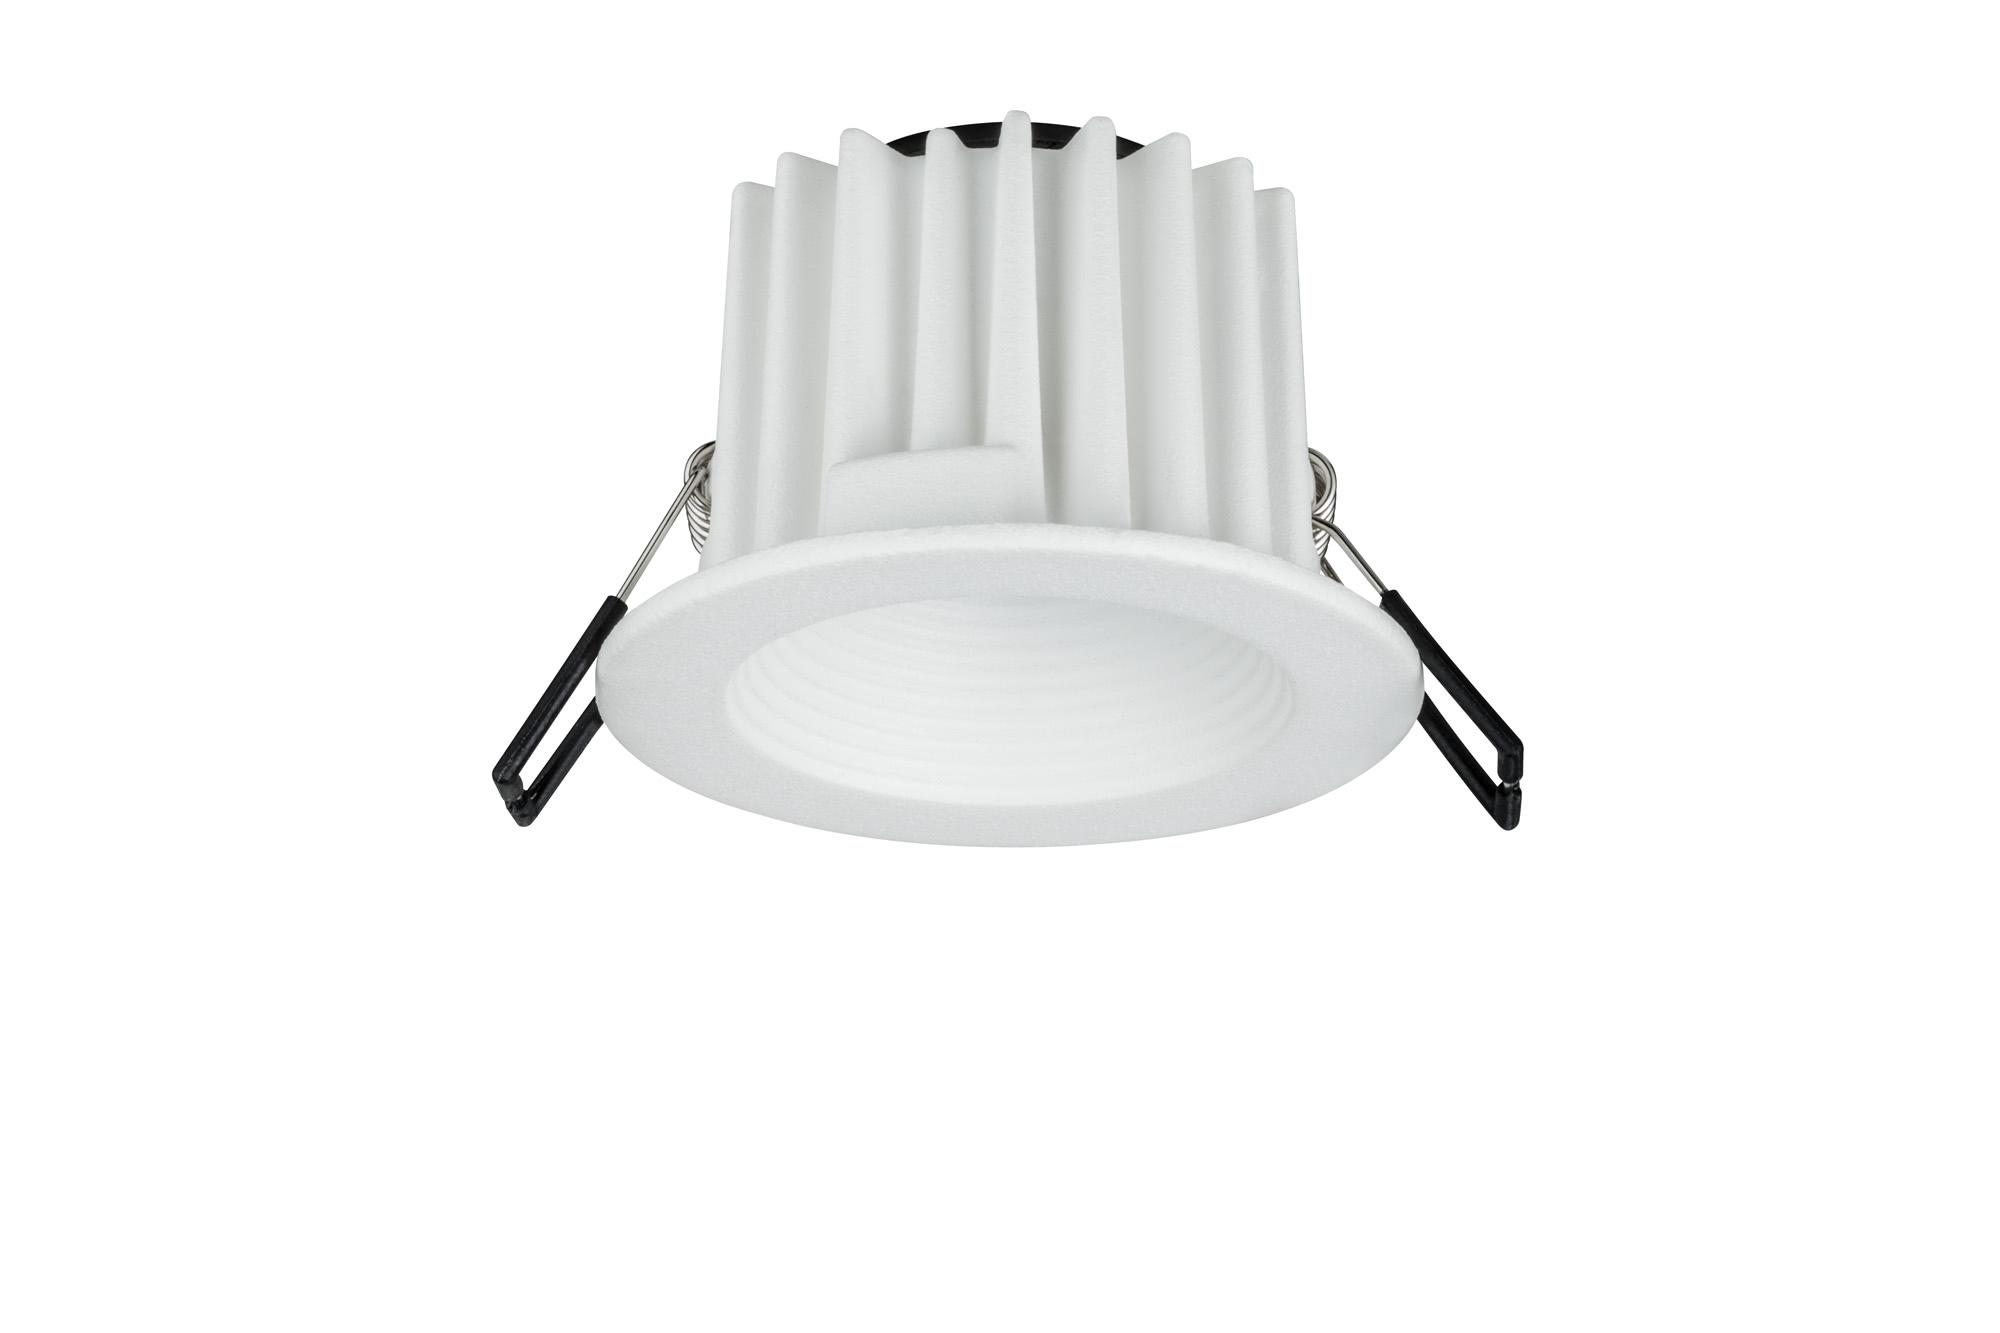 Paulmann. 92635 Светильник встроенный Helia IP65 ru st LED 1x8,7W, белый